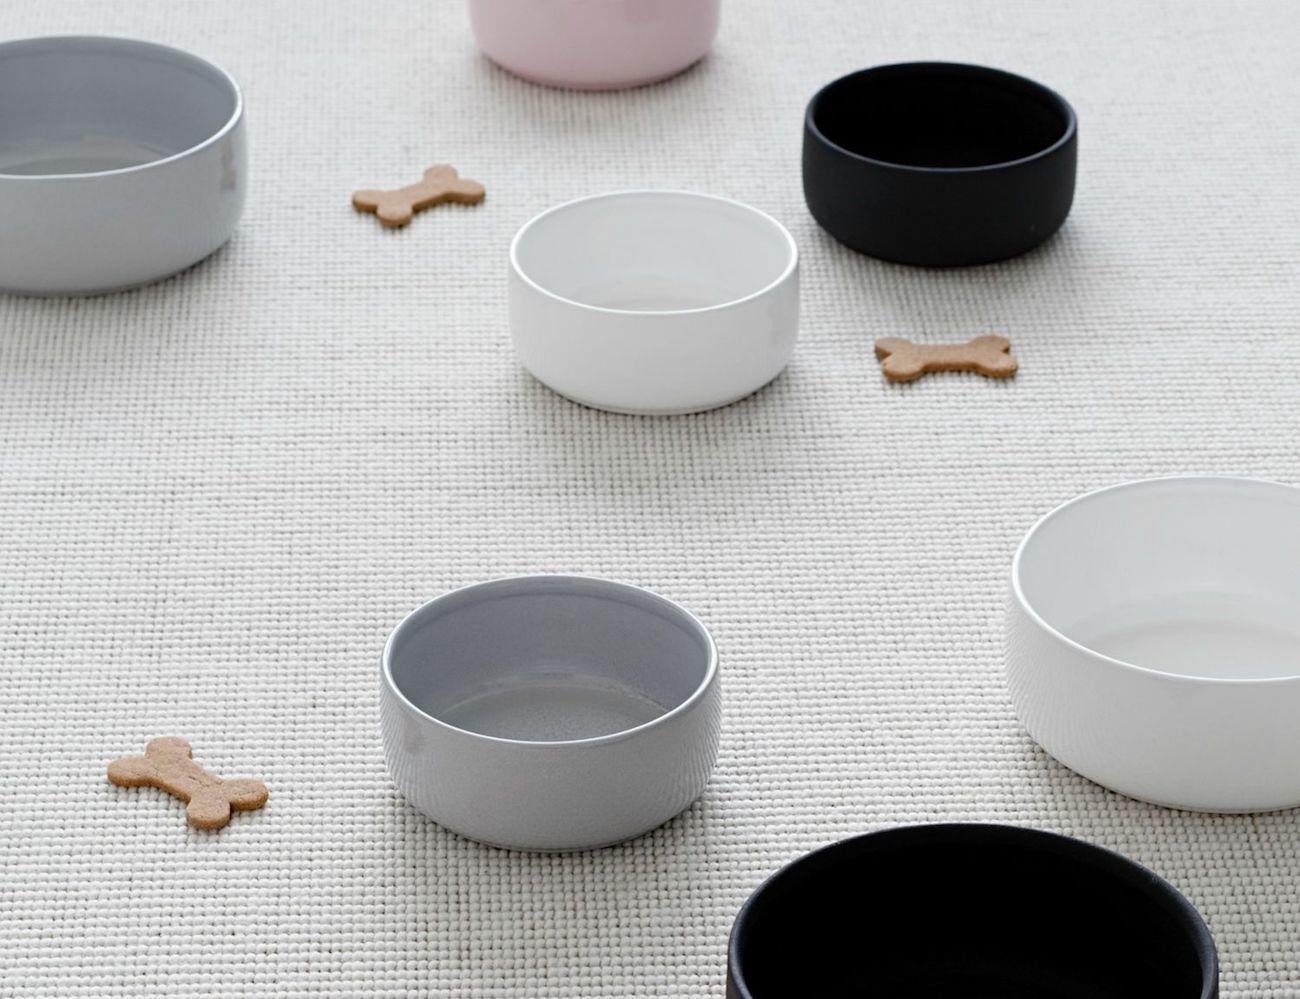 Ole Hyvä Ceramic Dog Bowl